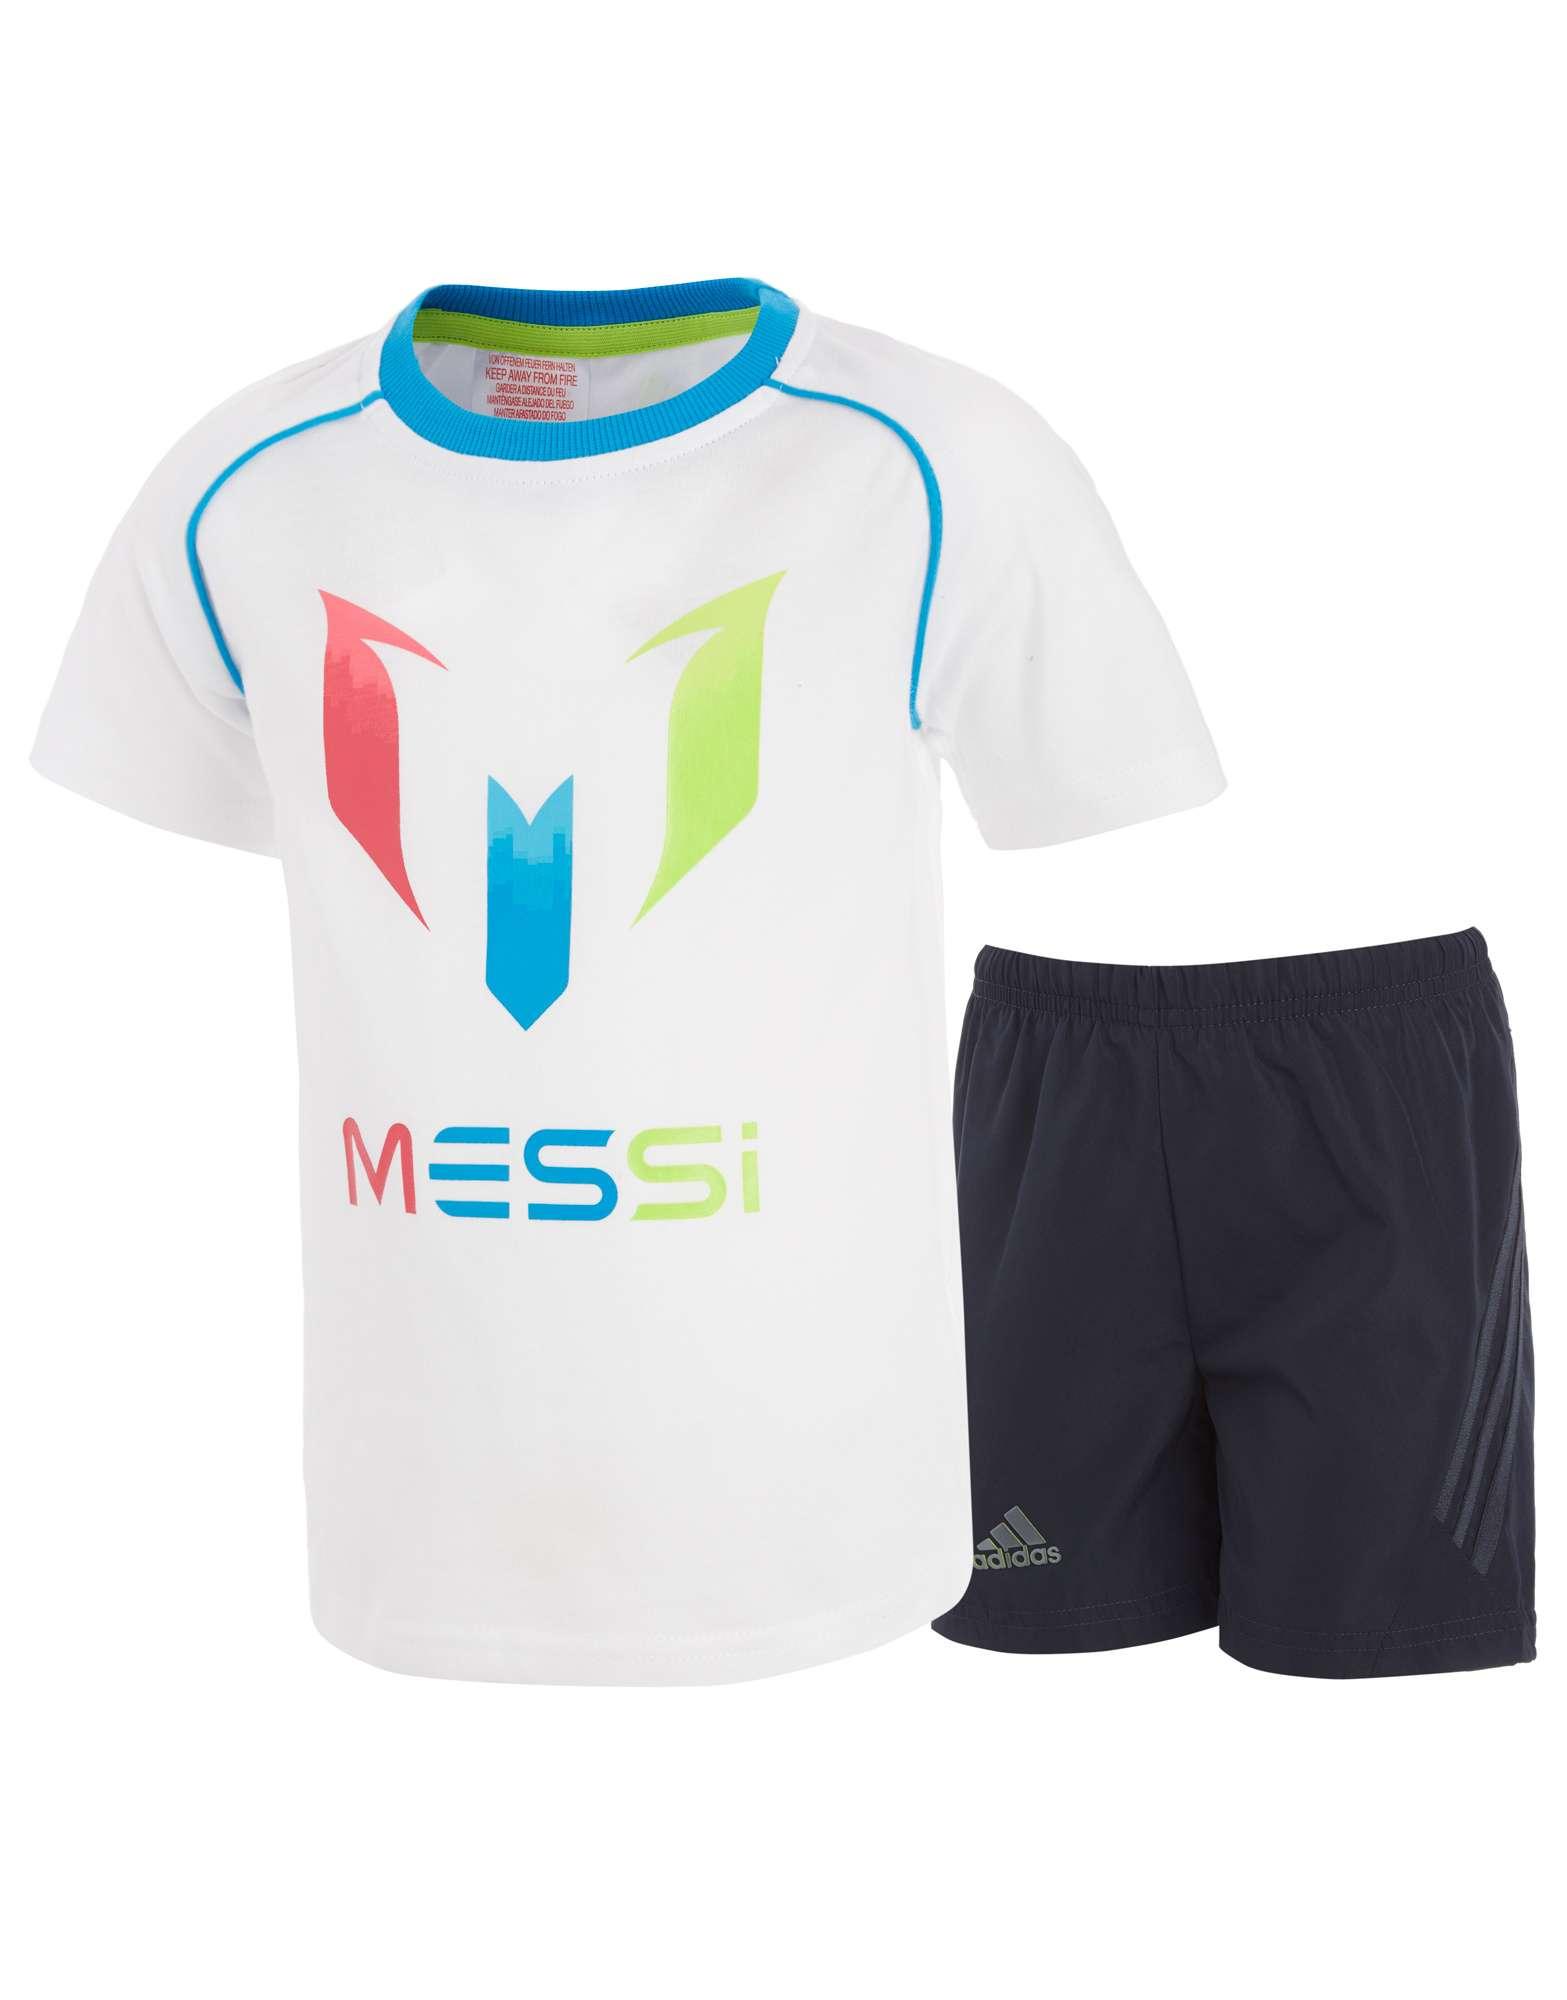 adidas Messi T-Shirt/Shorts Set Infants